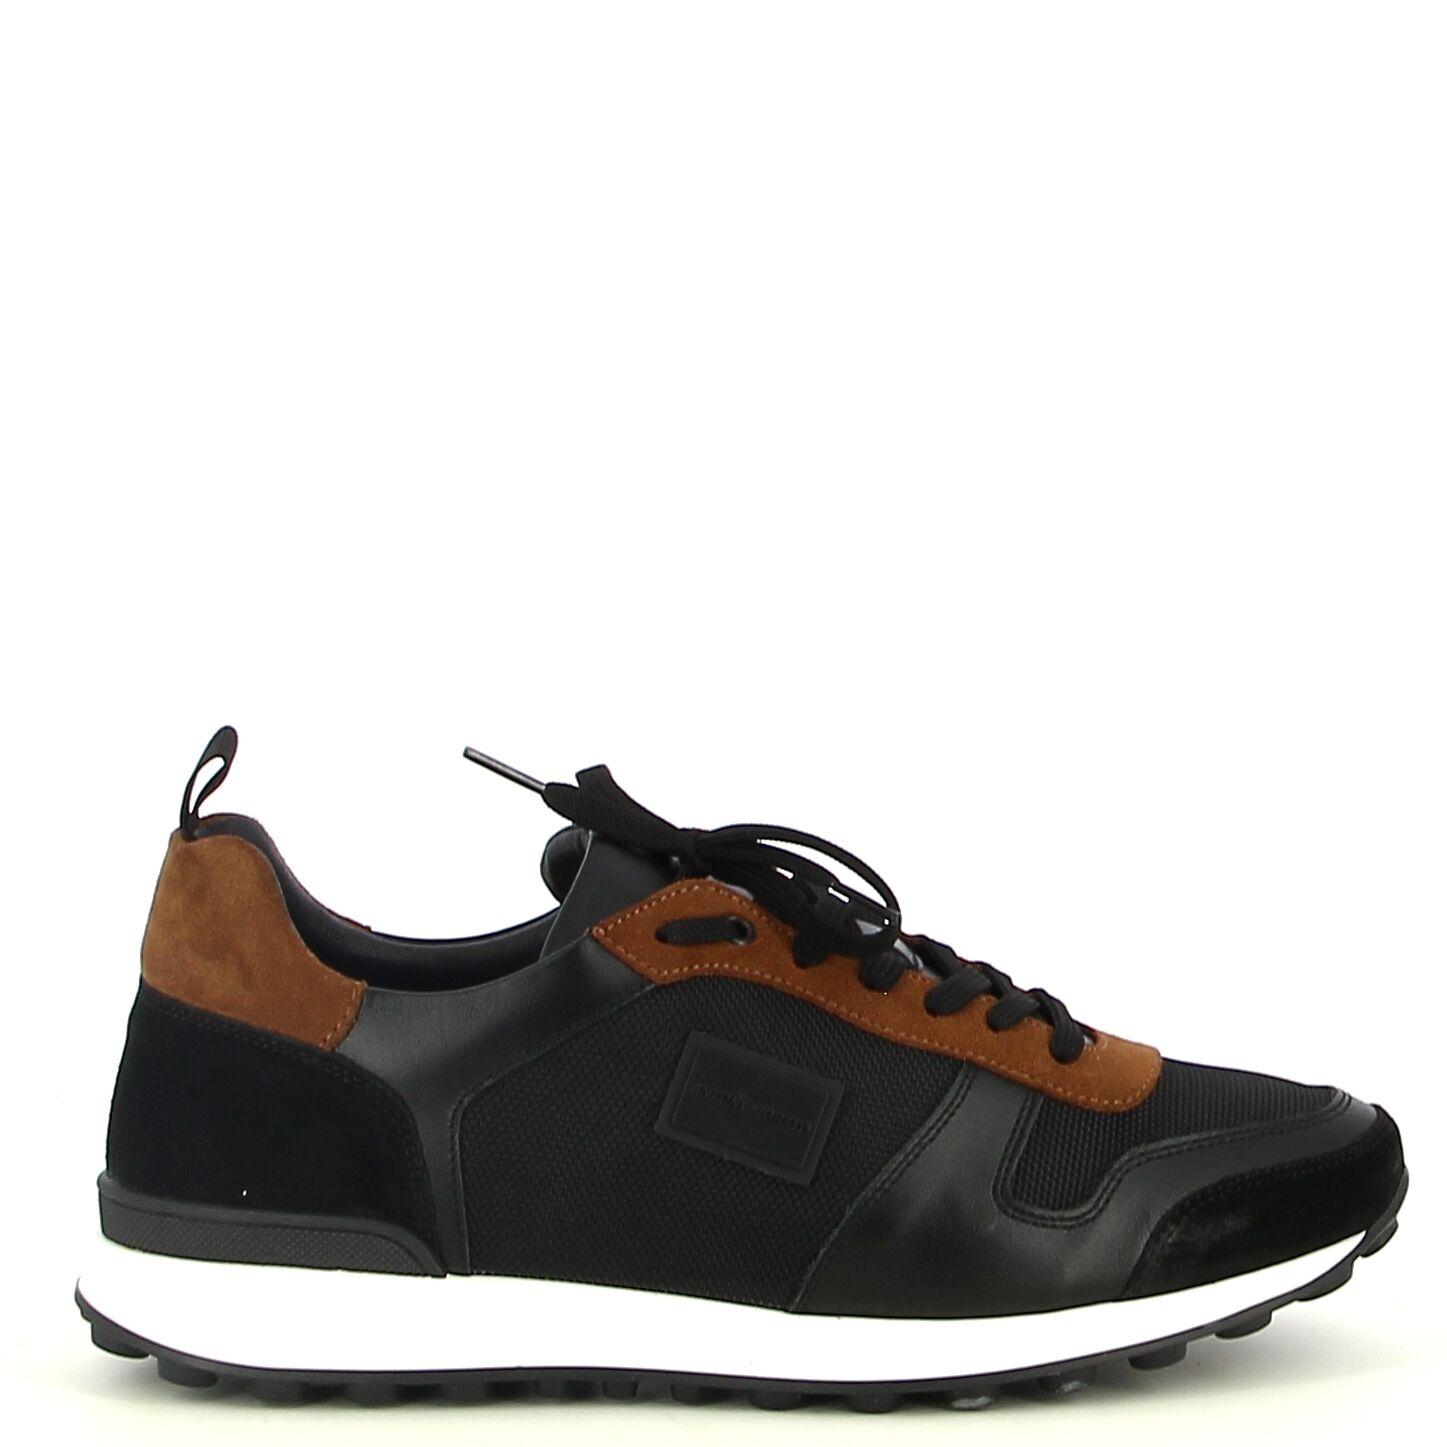 Antony Morato - Zwart/Bruin - Sneakers